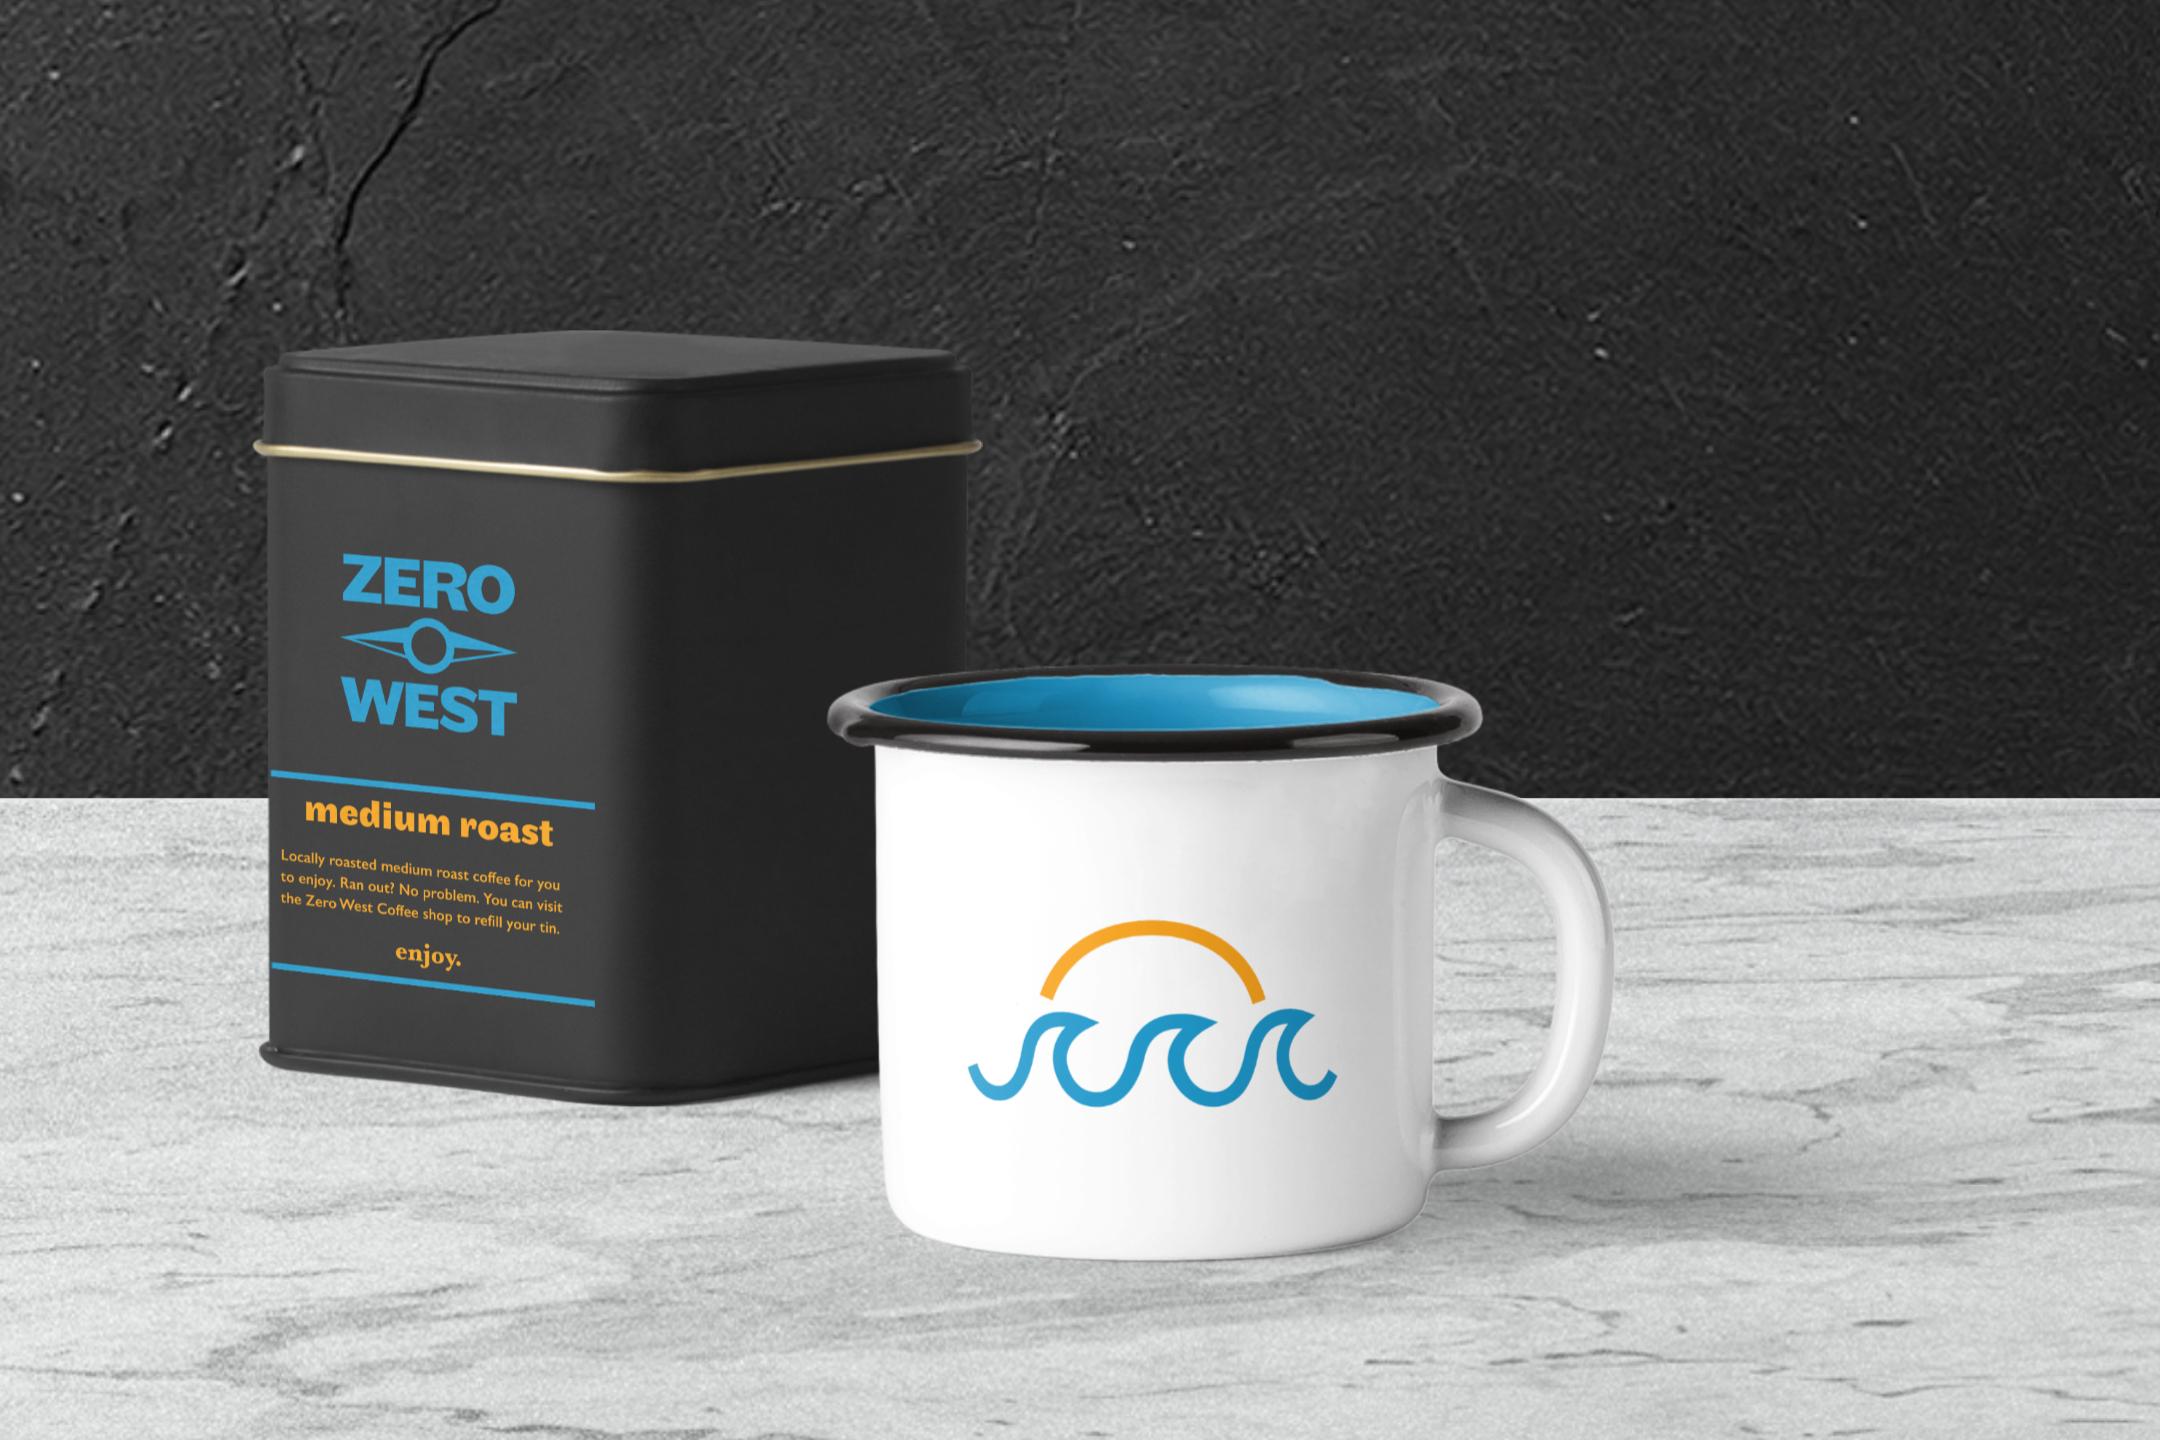 Zero West: Coffee tin and mug